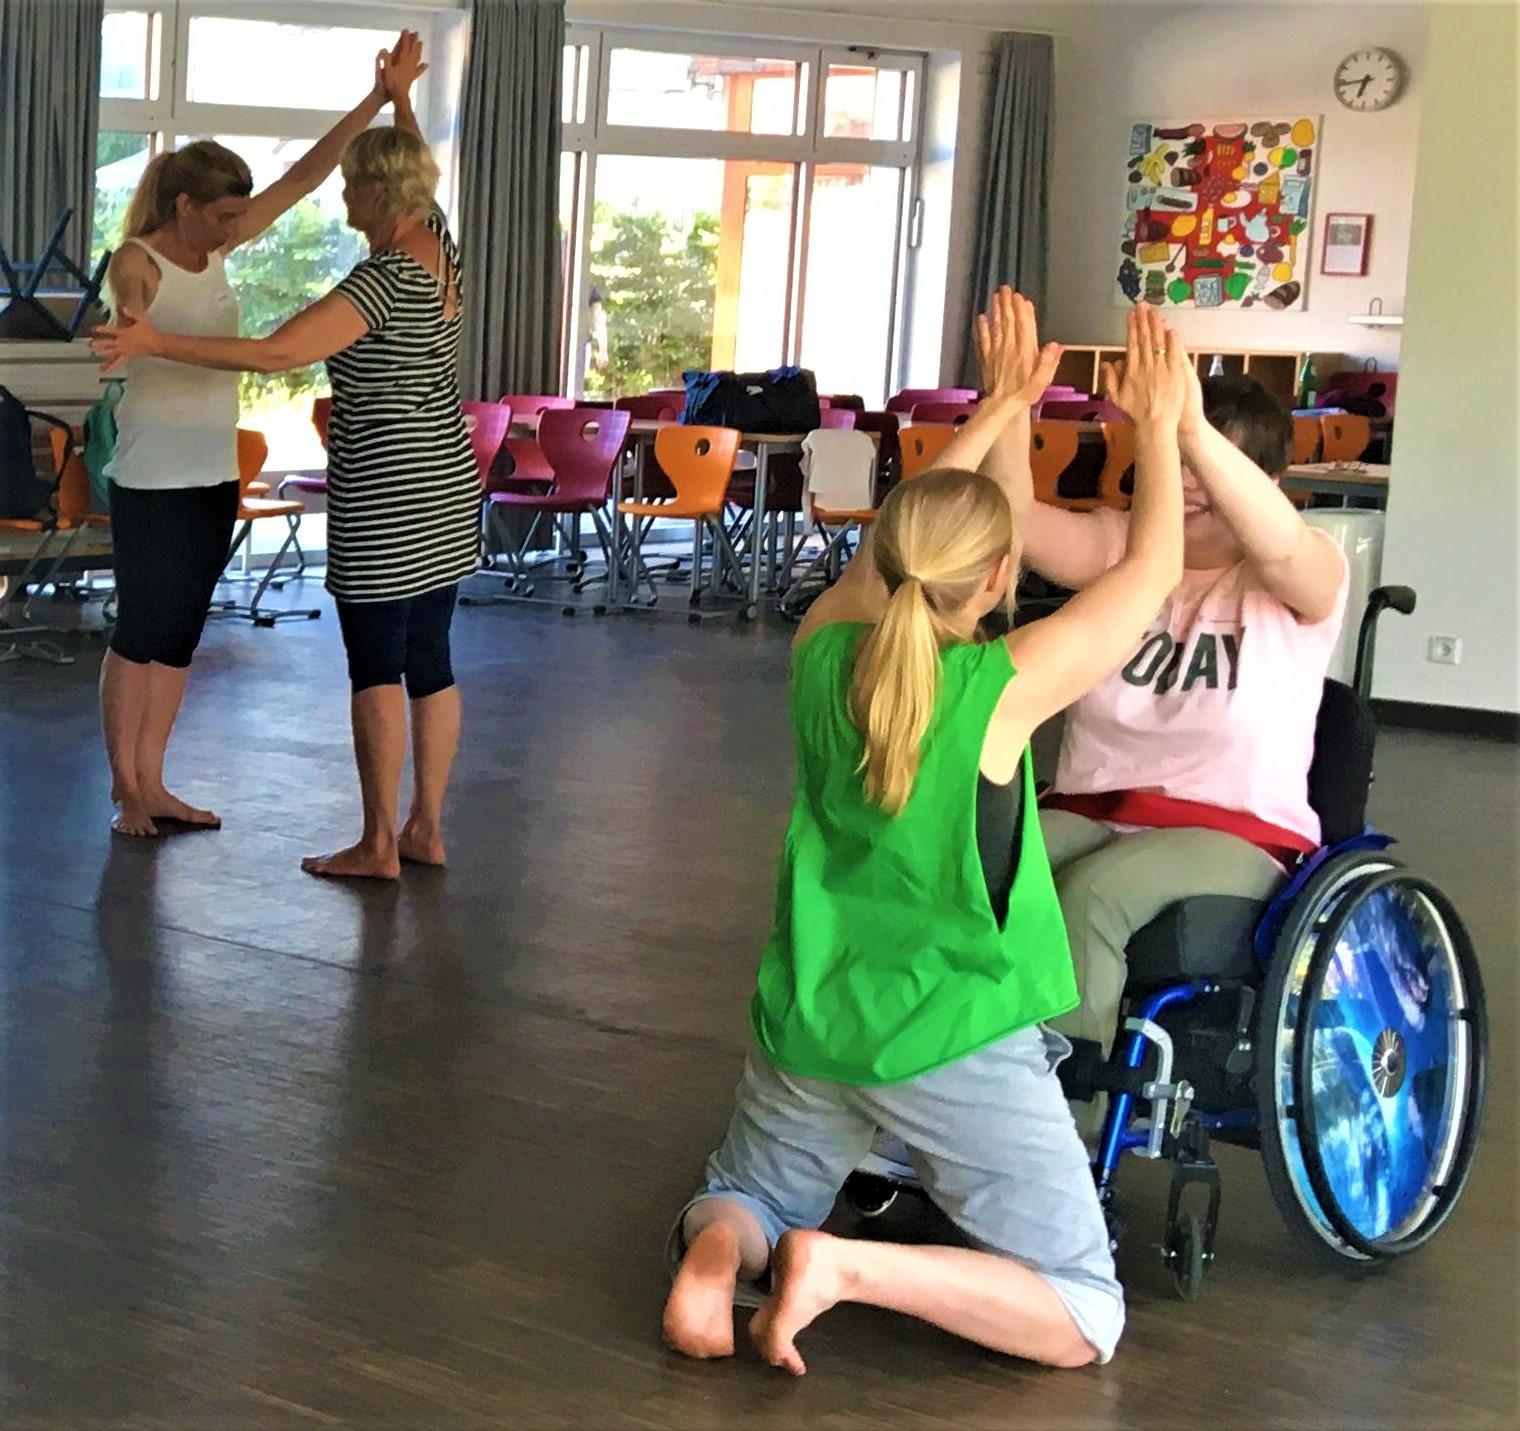 Community Dance Workshop bei Mixtur 1 am 28.06.2019